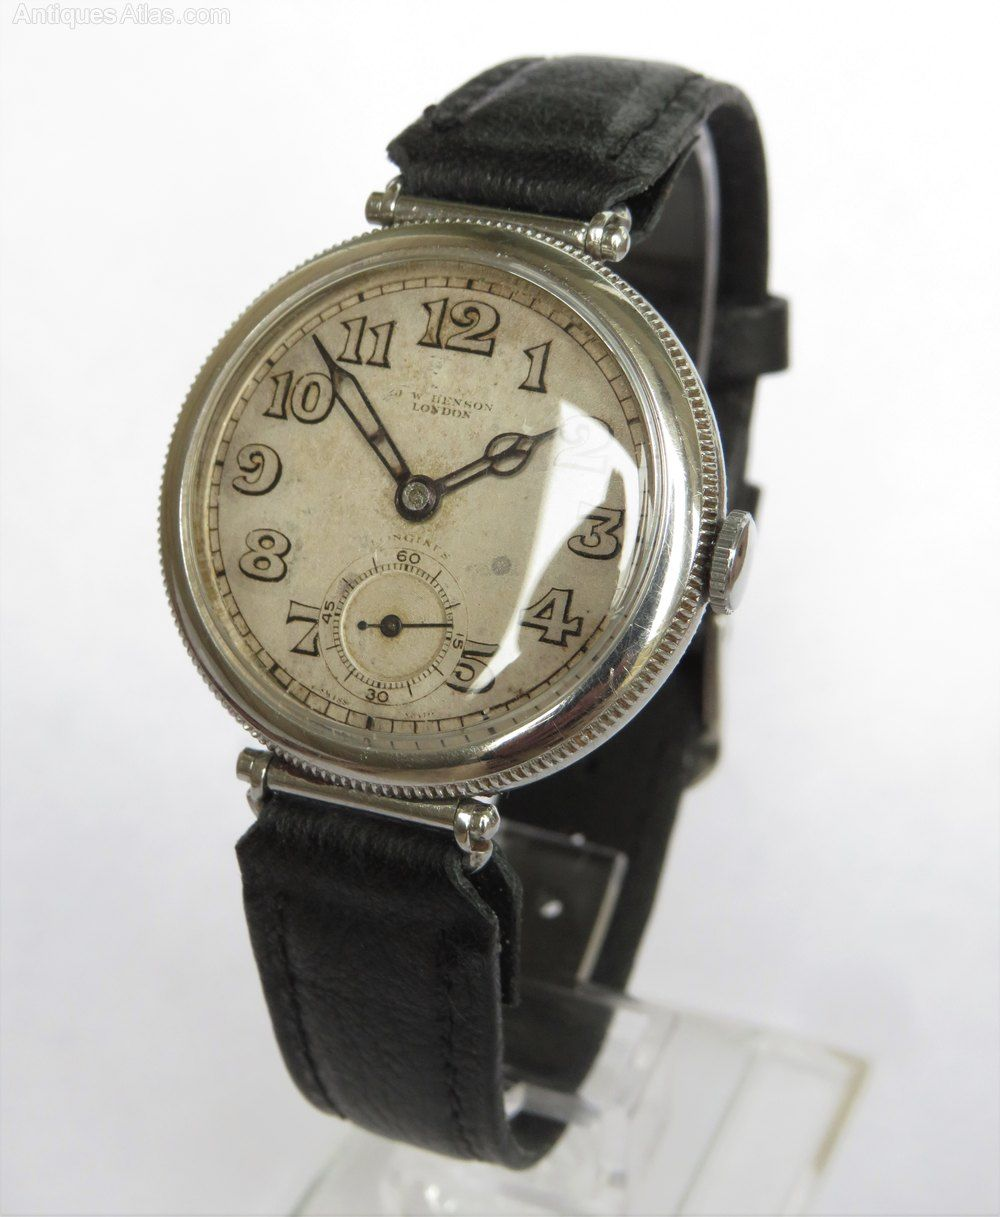 Gents 1936 Longines wristwatch for J W Benson #vintagewatches